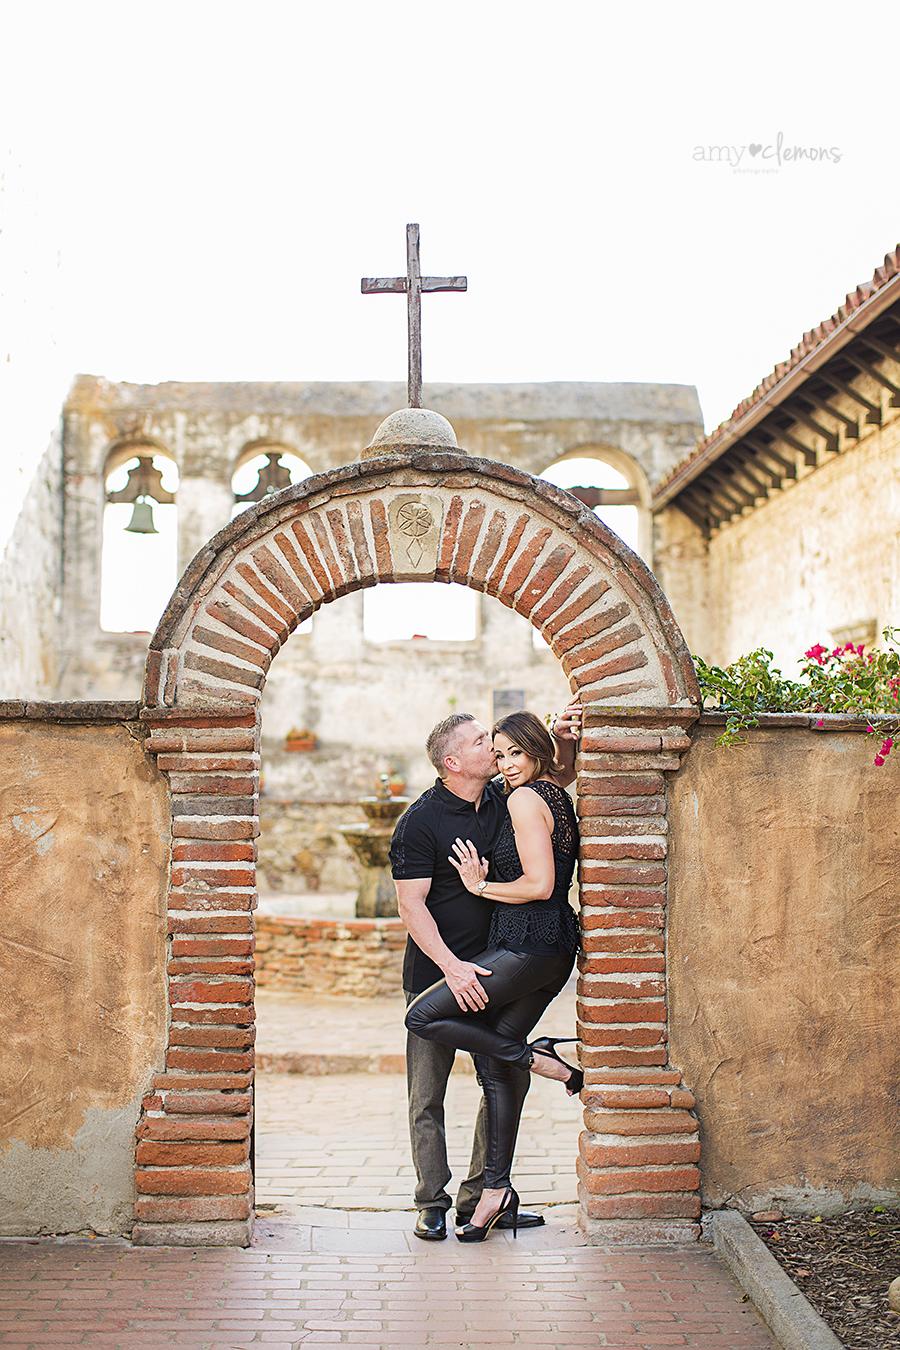 San Juan Capistrano Mission, Amy Clemons Photography (4)